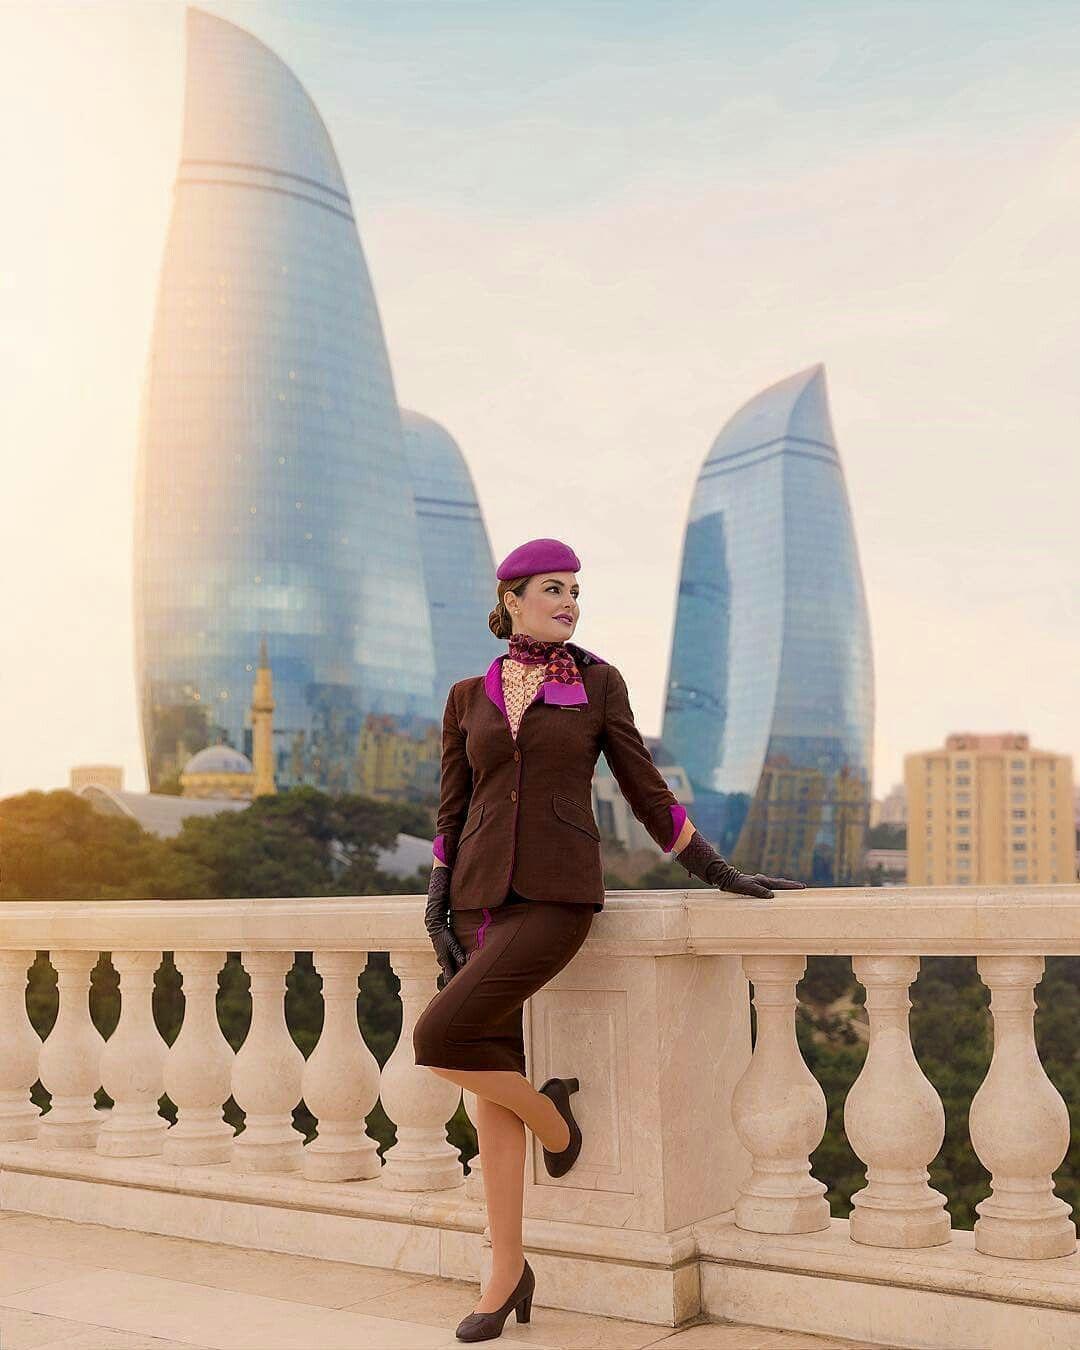 Pin By Uae 7 On Abu Dhabi Abu Dhabi Grand Prix Flight Attendant Uniform Skyline